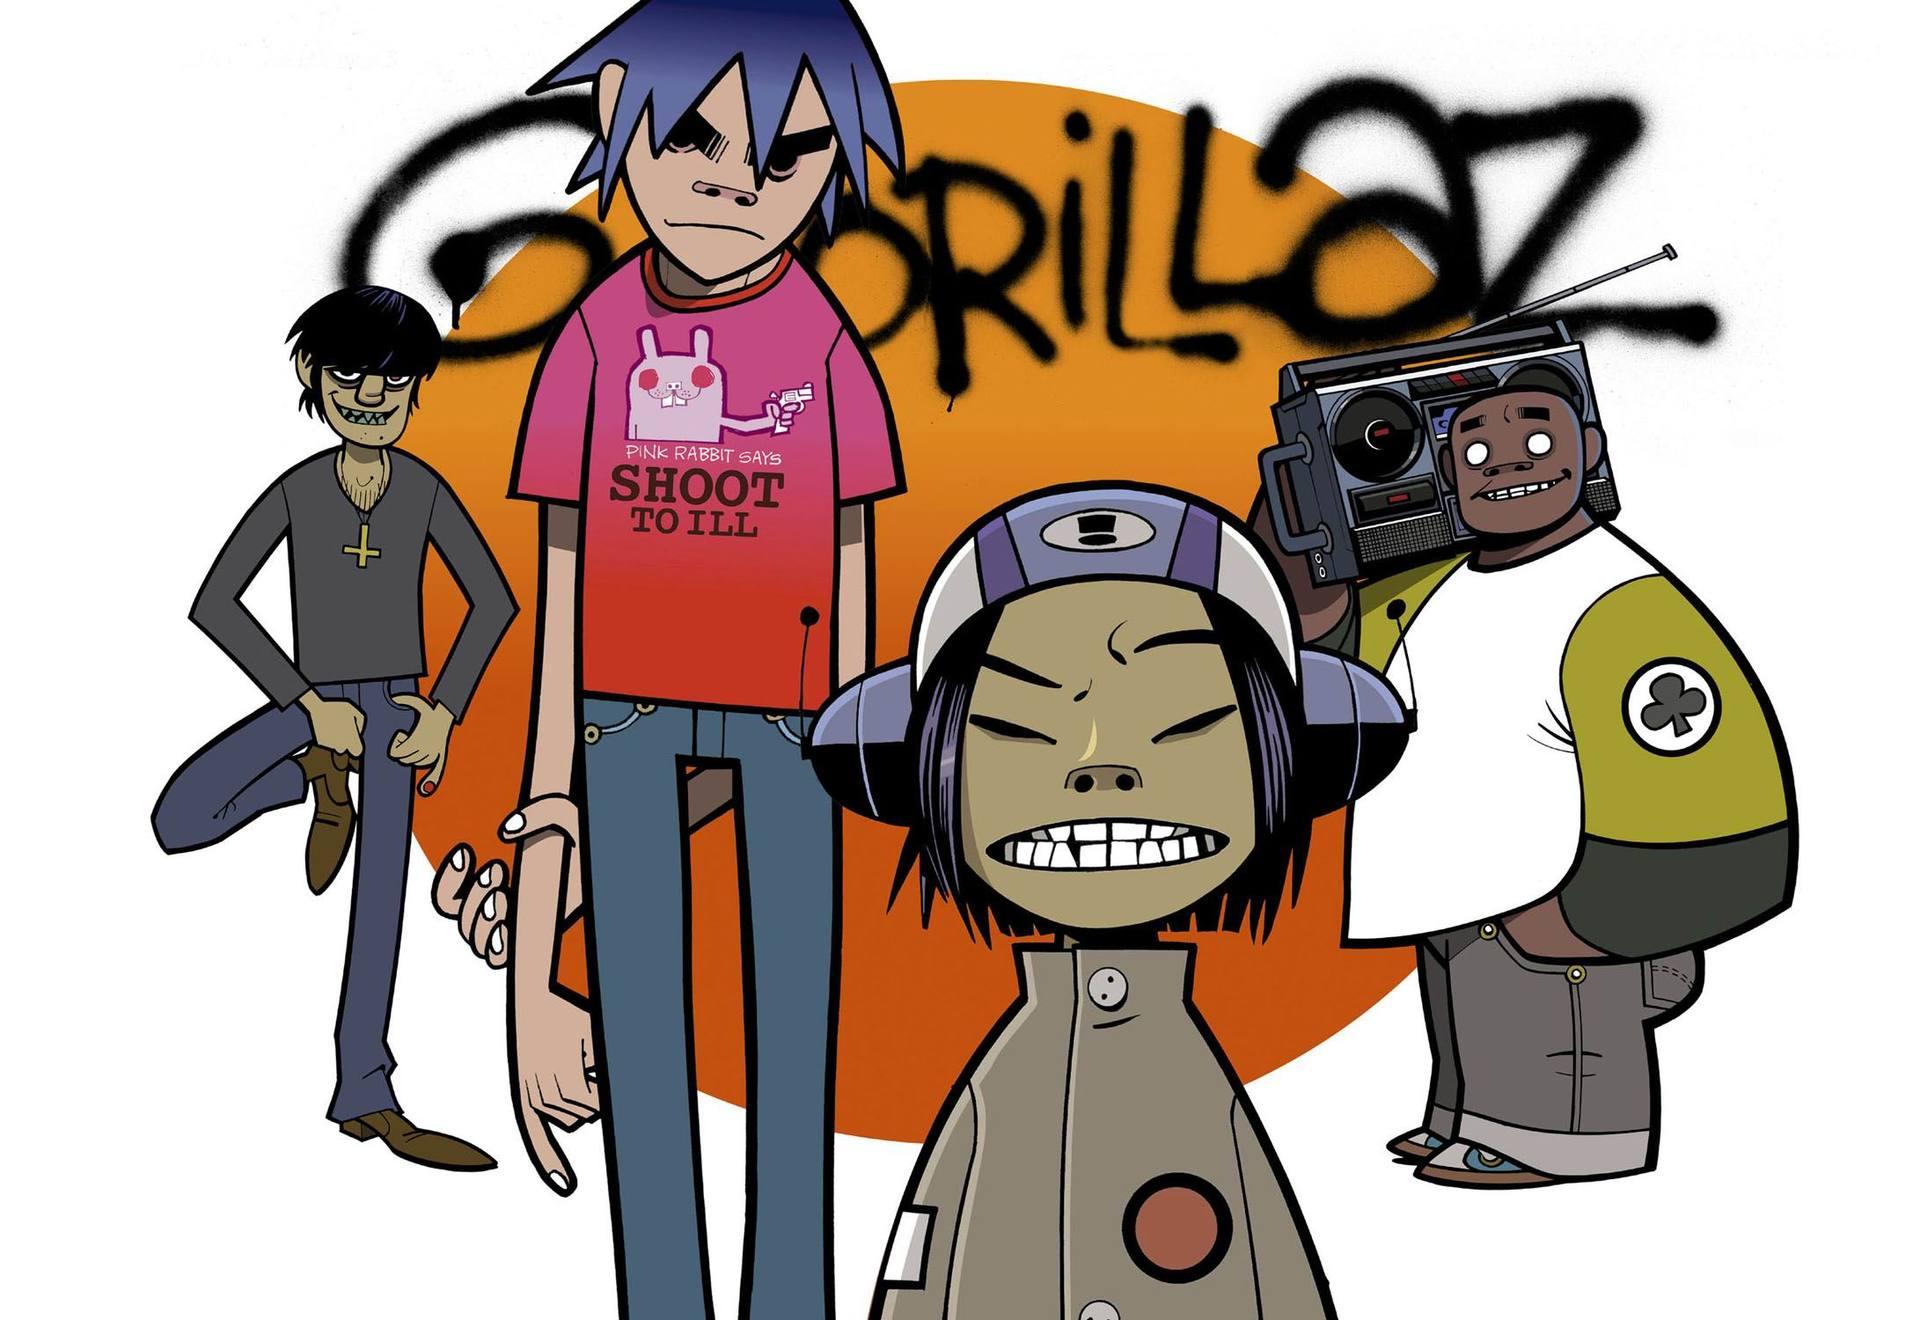 http://www.festivalrykten.se/wp-content/uploads/2014/08/gorillaz-gorillaz-338179_1920_1320.jpg